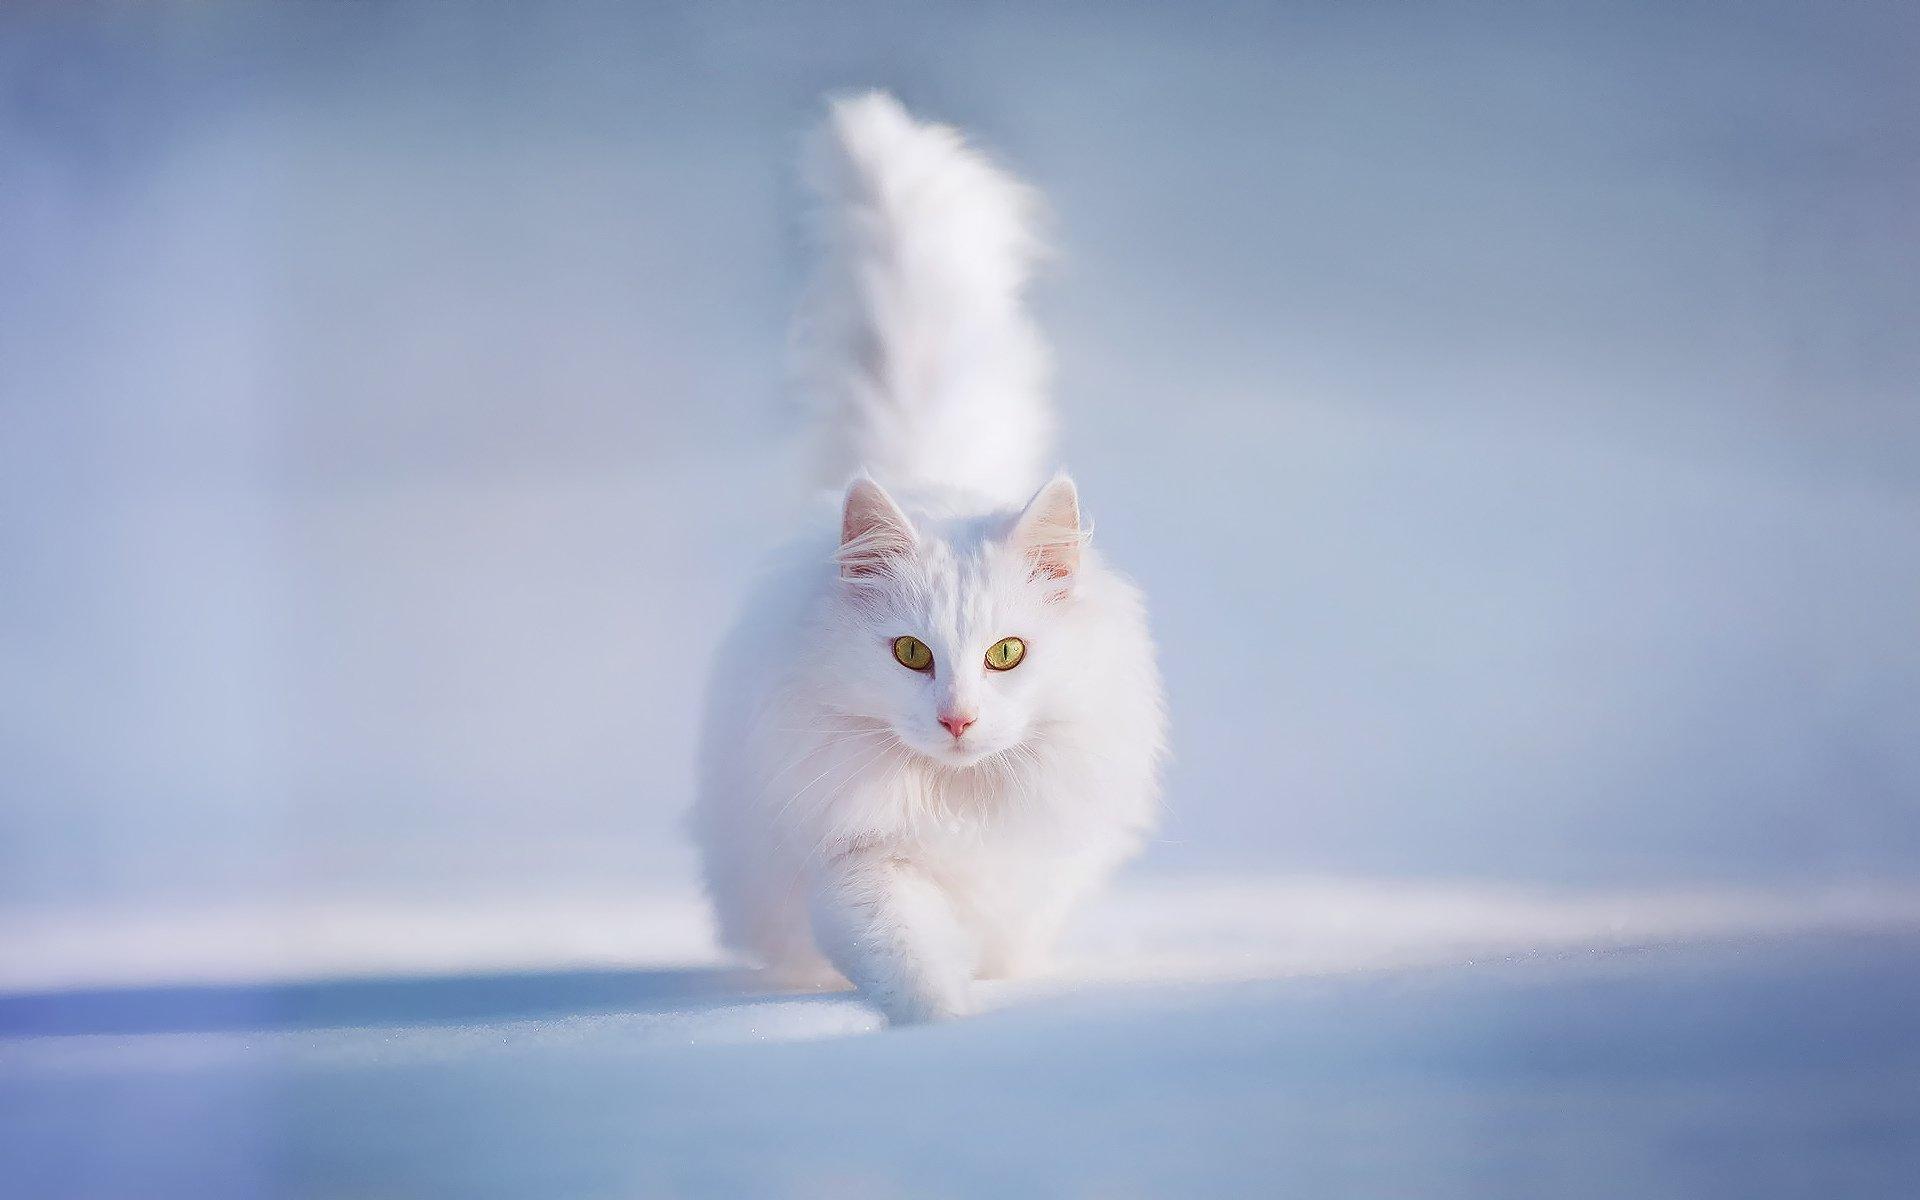 Snow Cat Wallpaper Www Bilderbeste Com